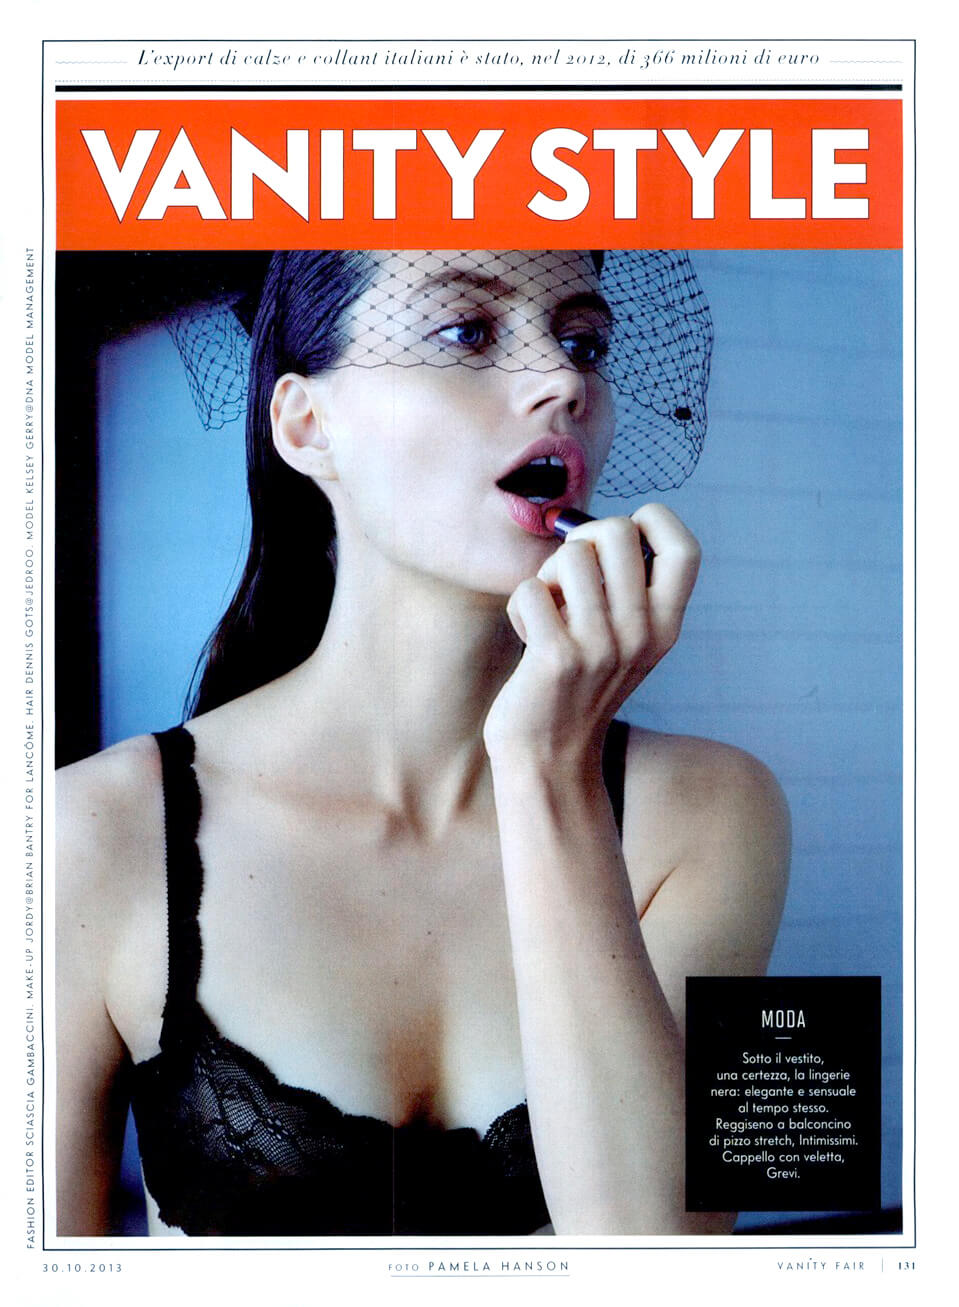 Veletta Grevi - Fascinator - Vanity Fair